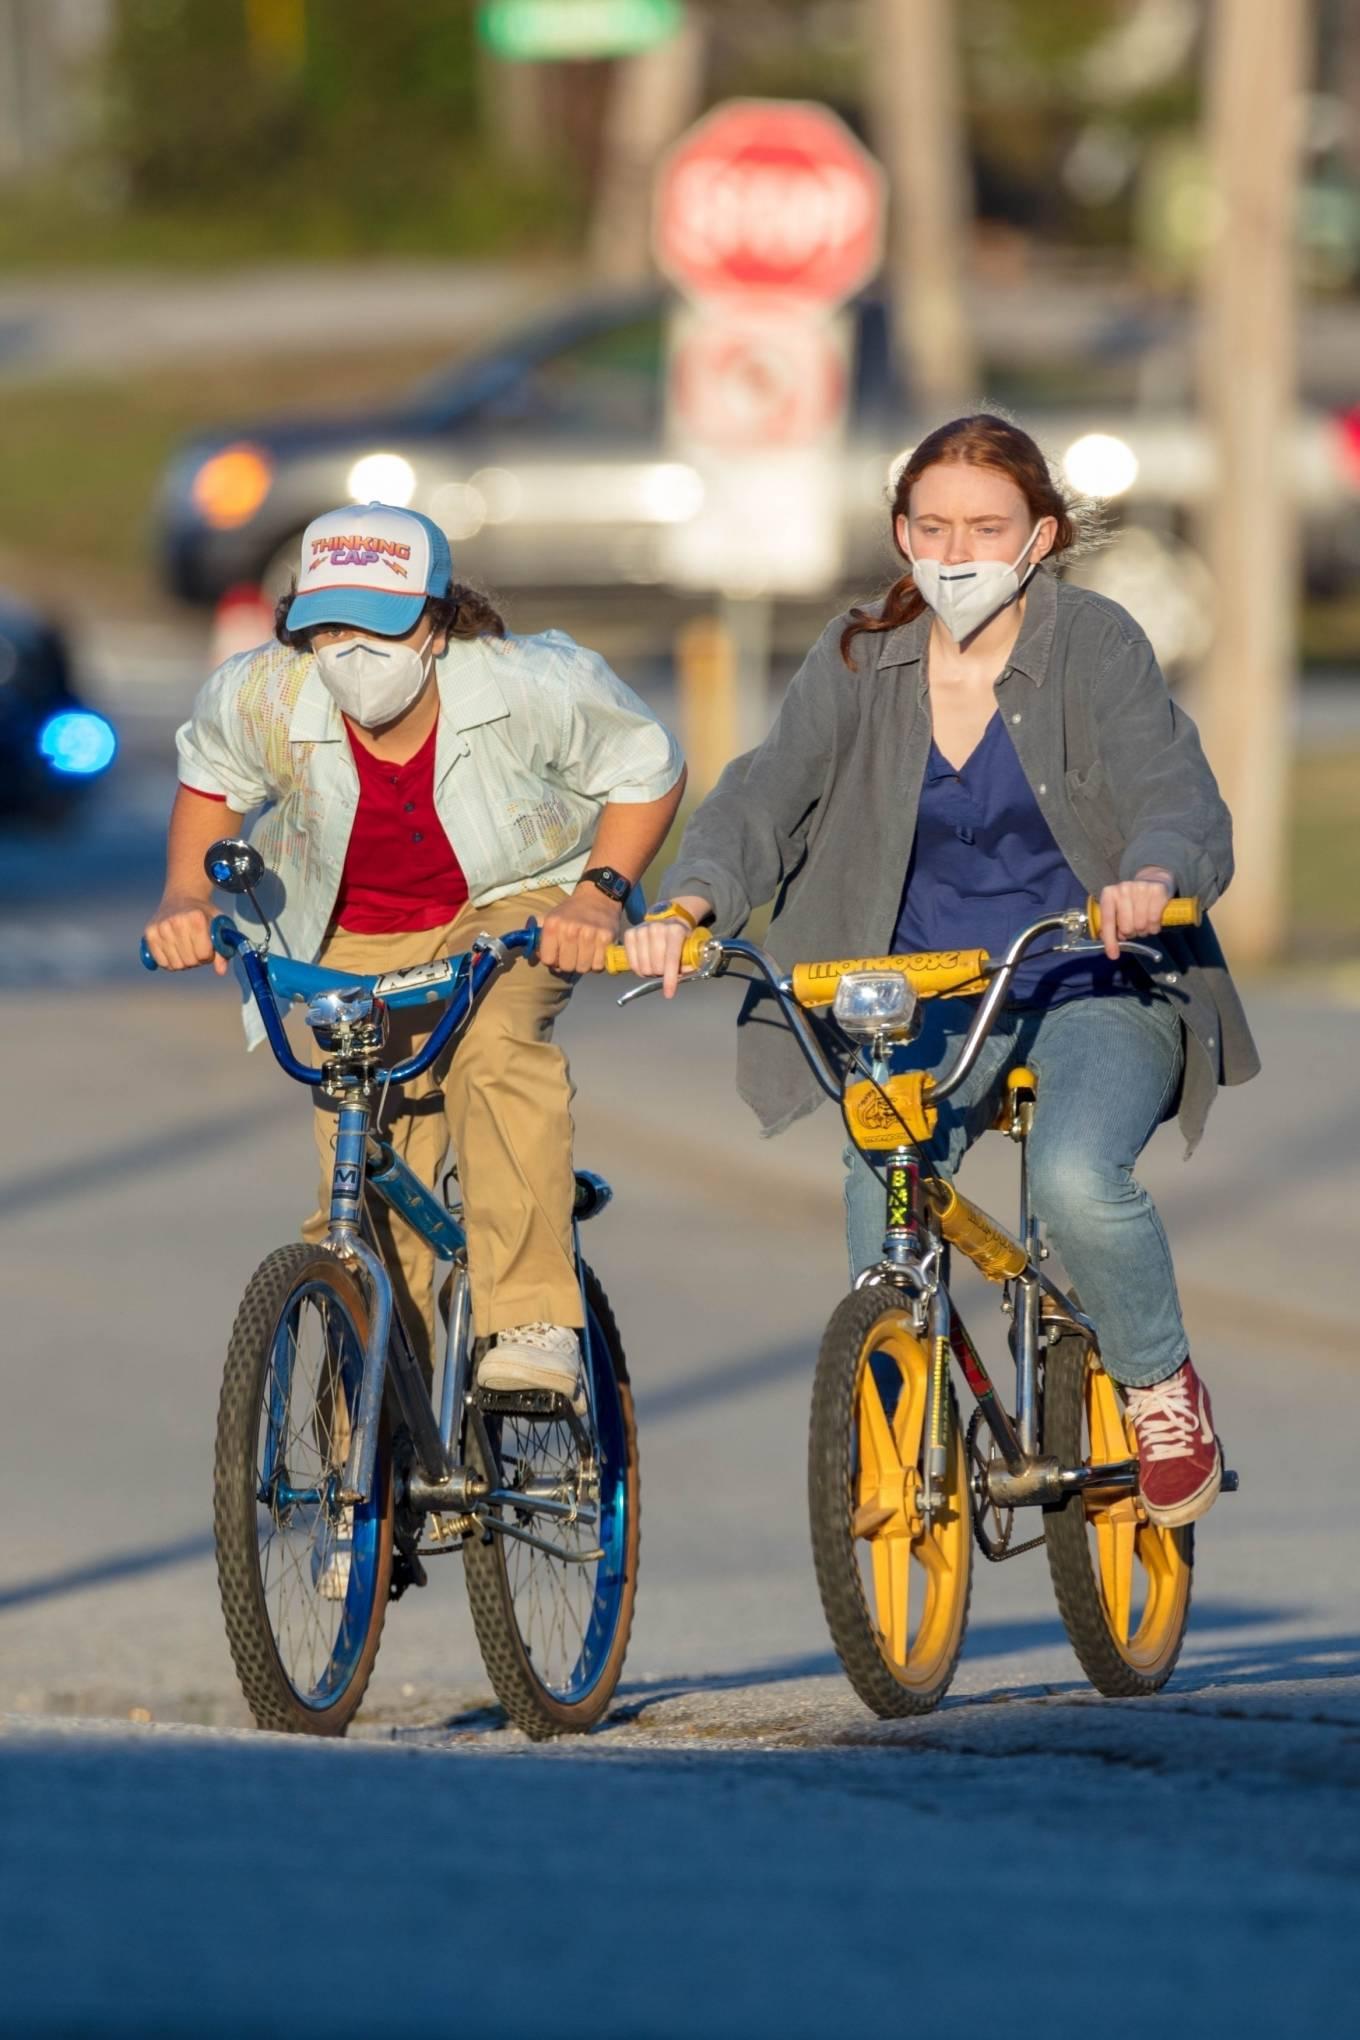 Sadie Sink 2020 : Gaten Matarazzo and Sadie Sink – Golden hour scene for Stranger Things Season 4 in Atlanta-01